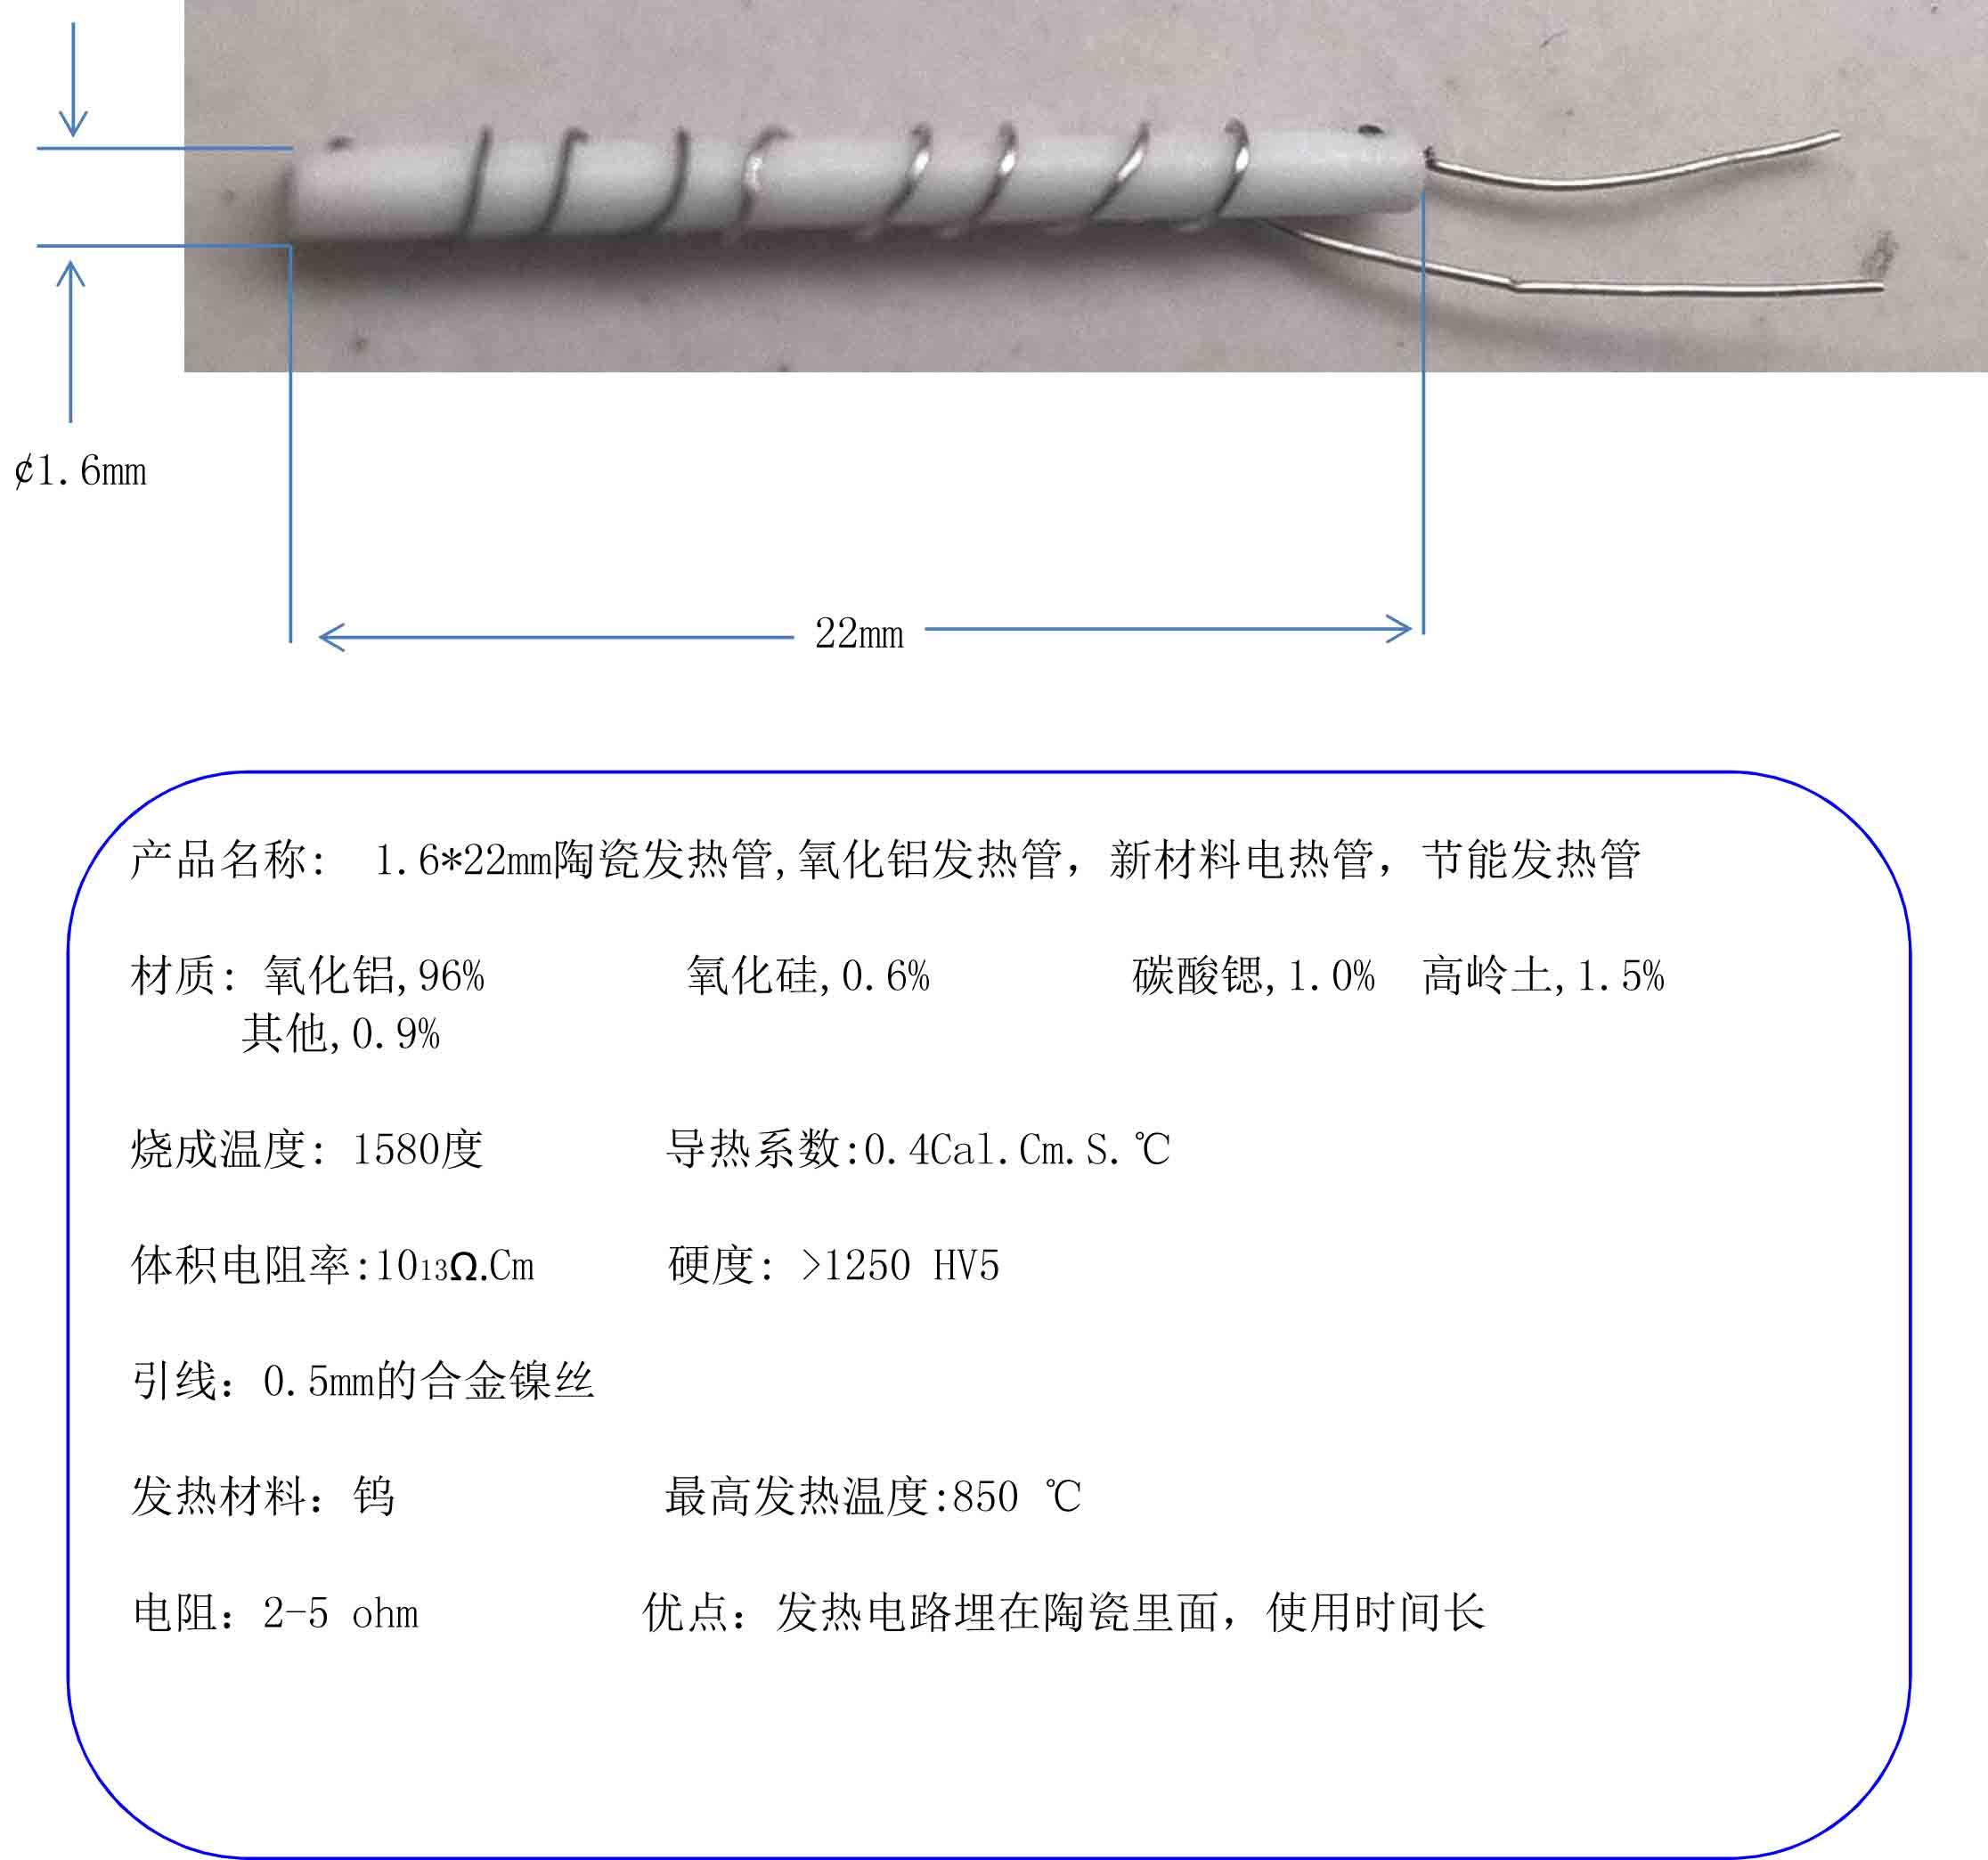 1.6*22mm ceramic heating tube, alumina heating tube, new material electric heating tube, energy saving heating tube ct4 22mm energy monitoring sensor clamp